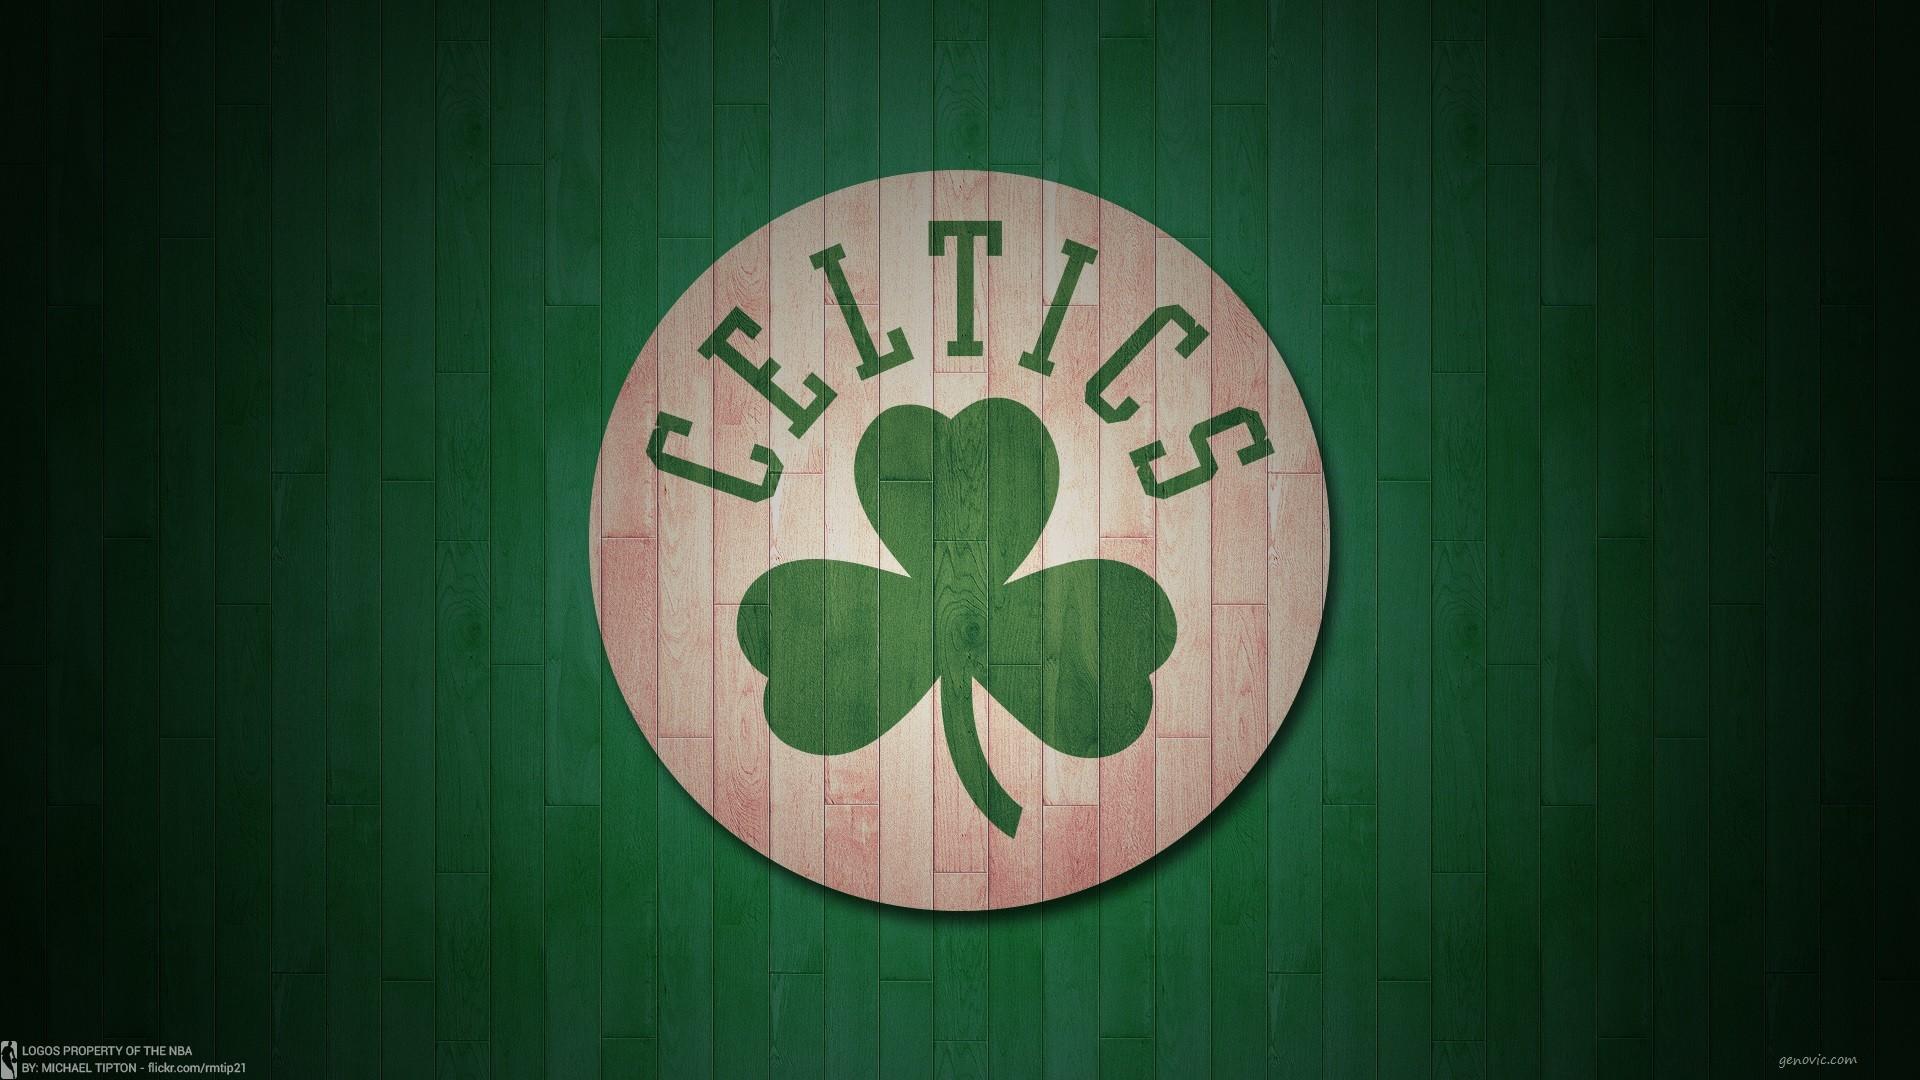 Boston Celtics Wallpapers HD Download 1600×1200 Boston Celtics Wallpaper  (47 Wallpapers)   Adorable Wallpapers   Desktop   Pinterest   Wallpaper